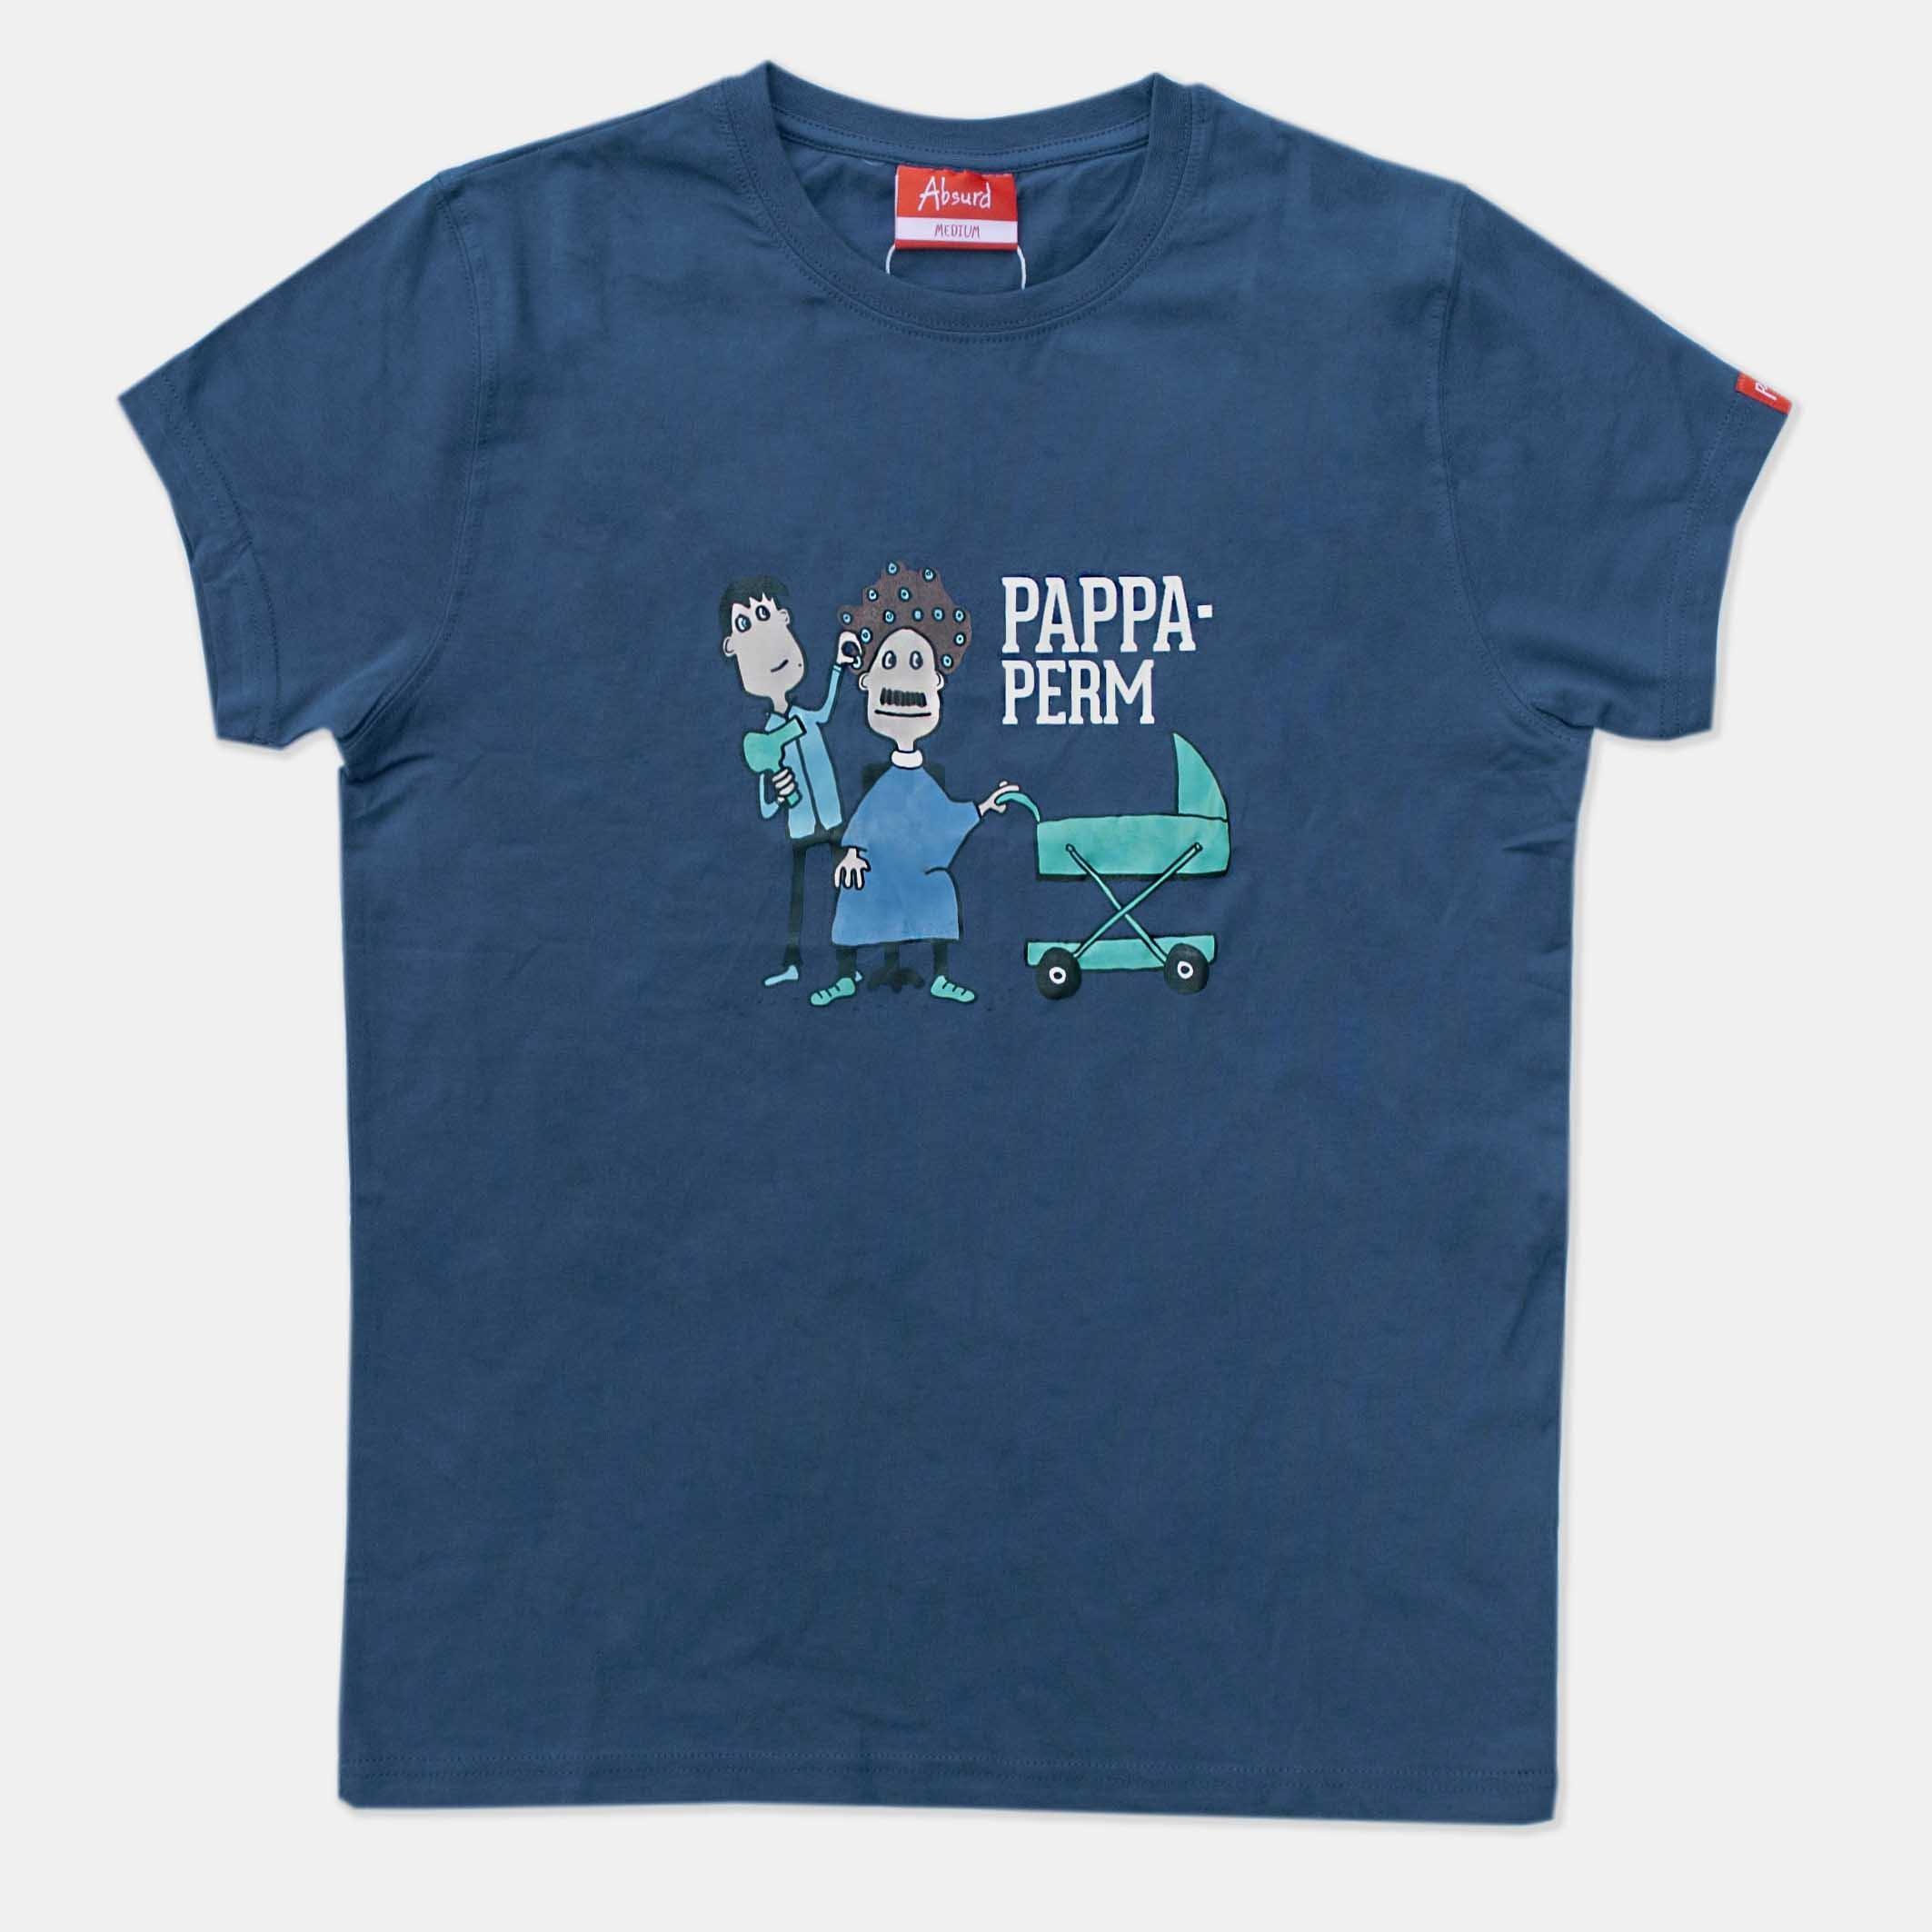 d813407e Pappaperm – blå t-skjorte | Probat